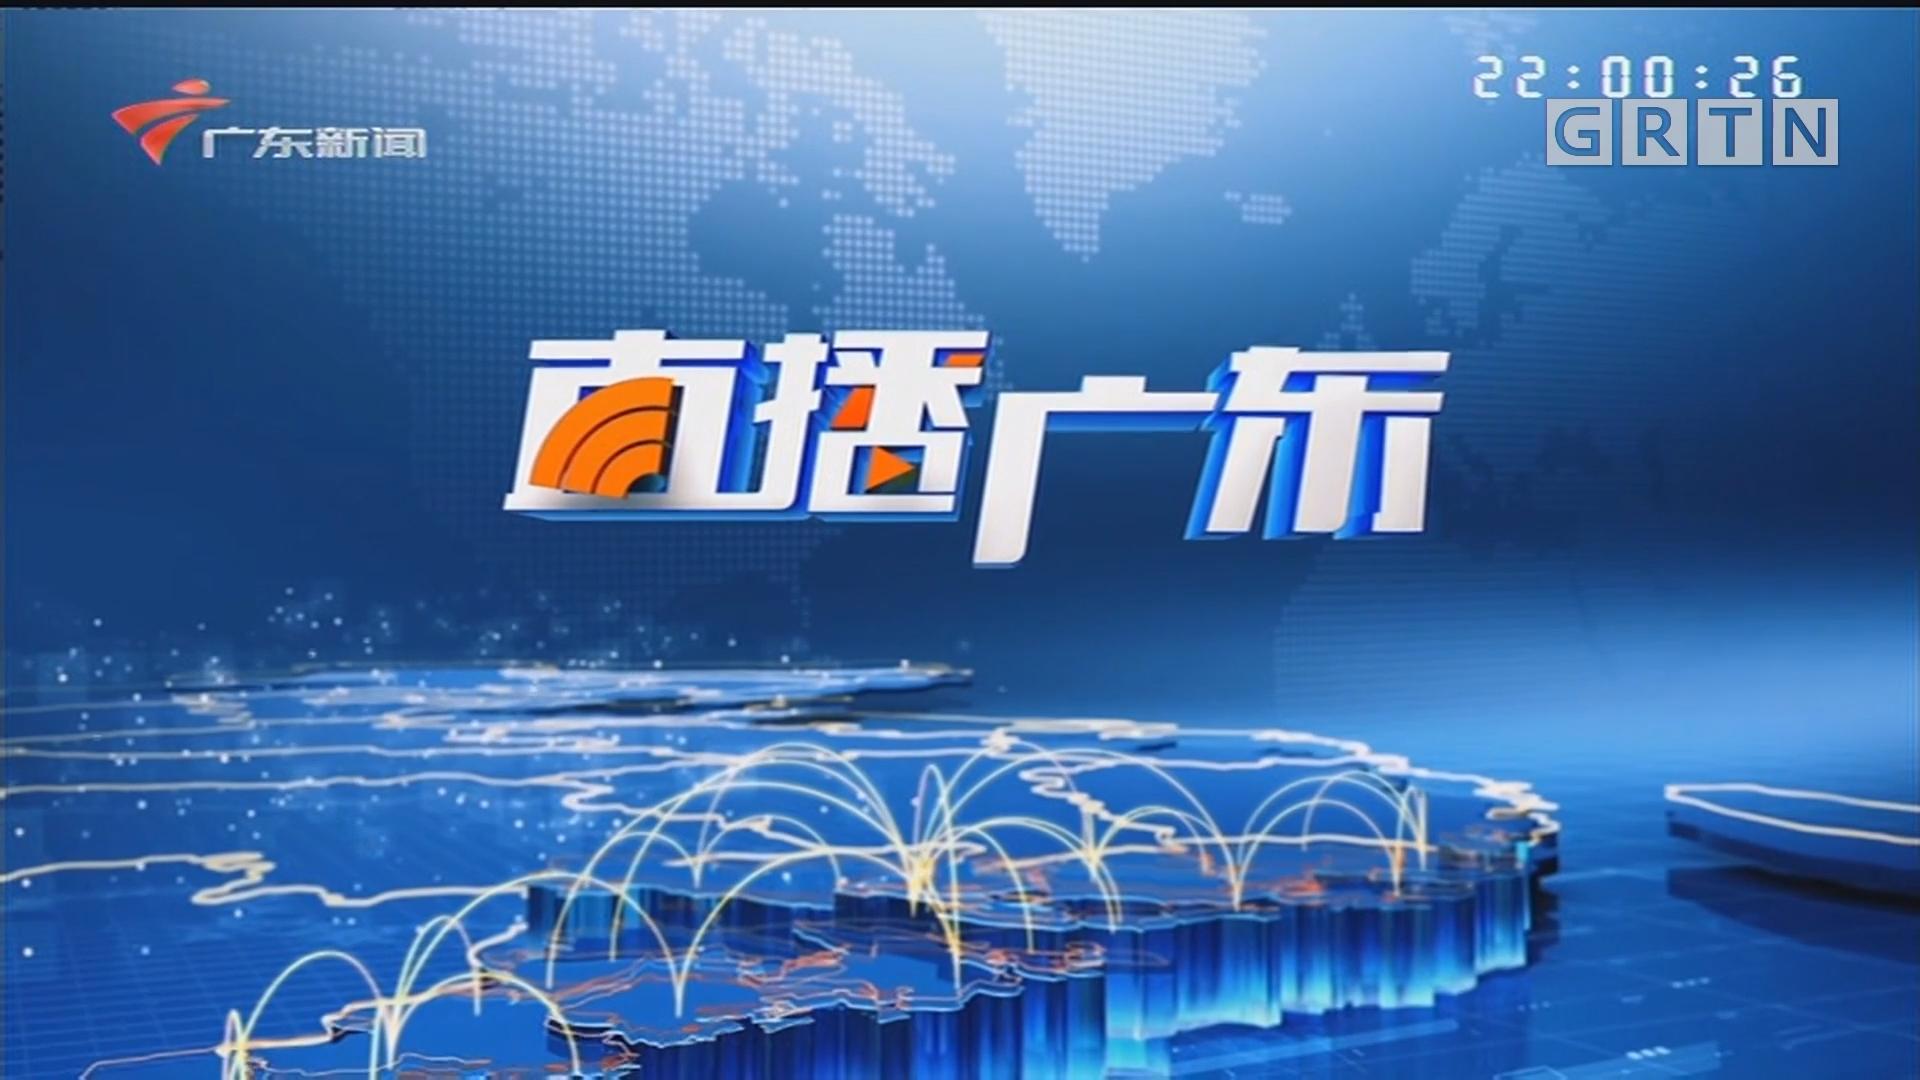 [HD][2020-02-15]直播广东:制定空调运行指南 阻止疫情蔓延扩散